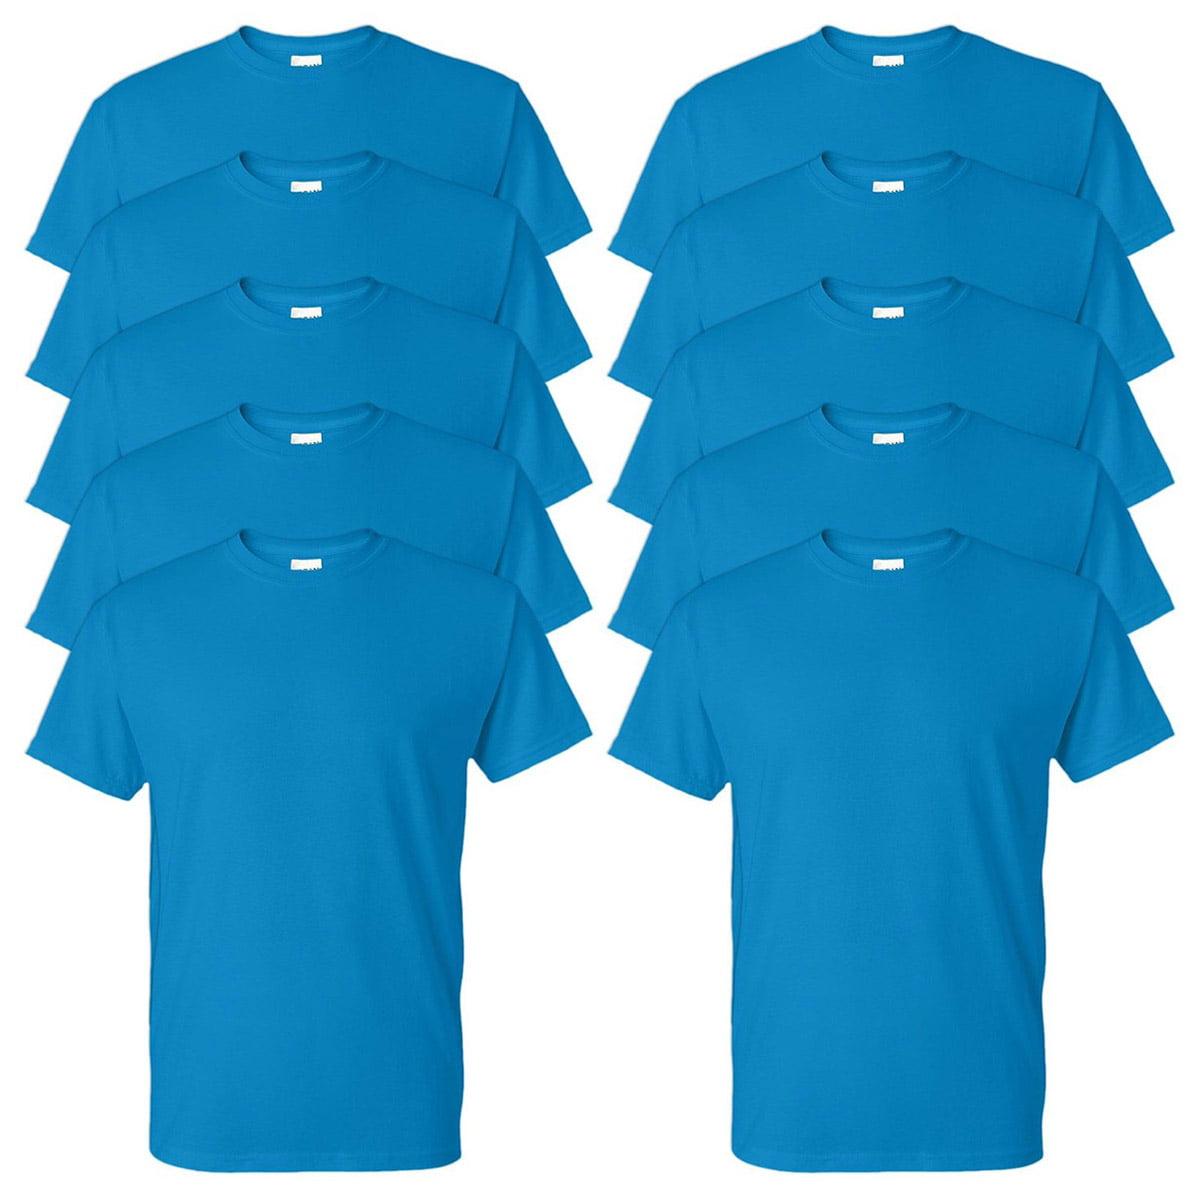 white Gildan Mens Seamless Double Needle T-Shirt Pack10 Small.